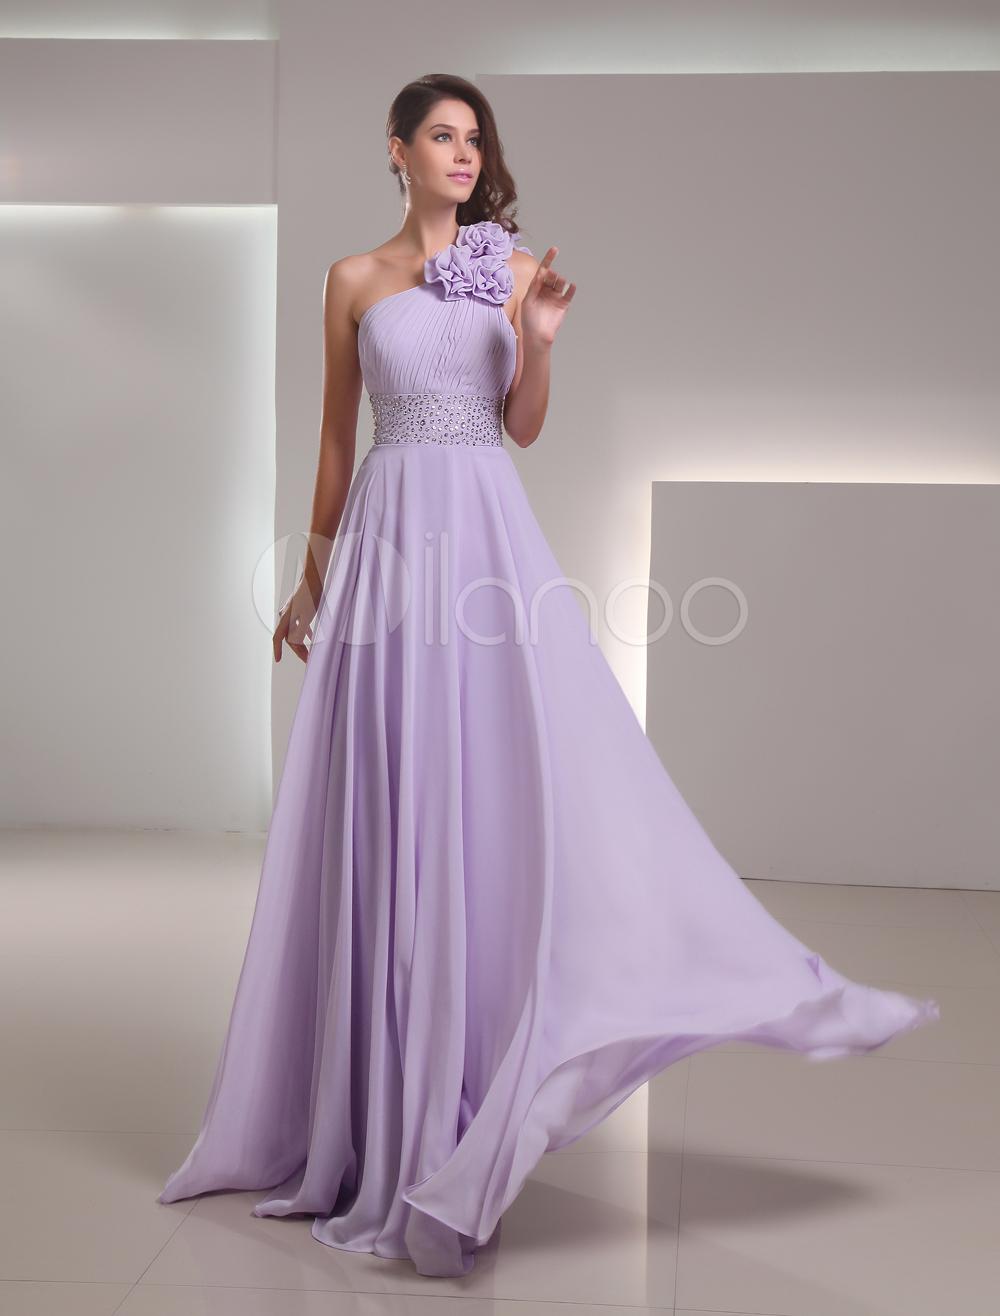 Lilac Chiffon Floor-Length Prom Dress With One-Shoulder - Milanoo.com